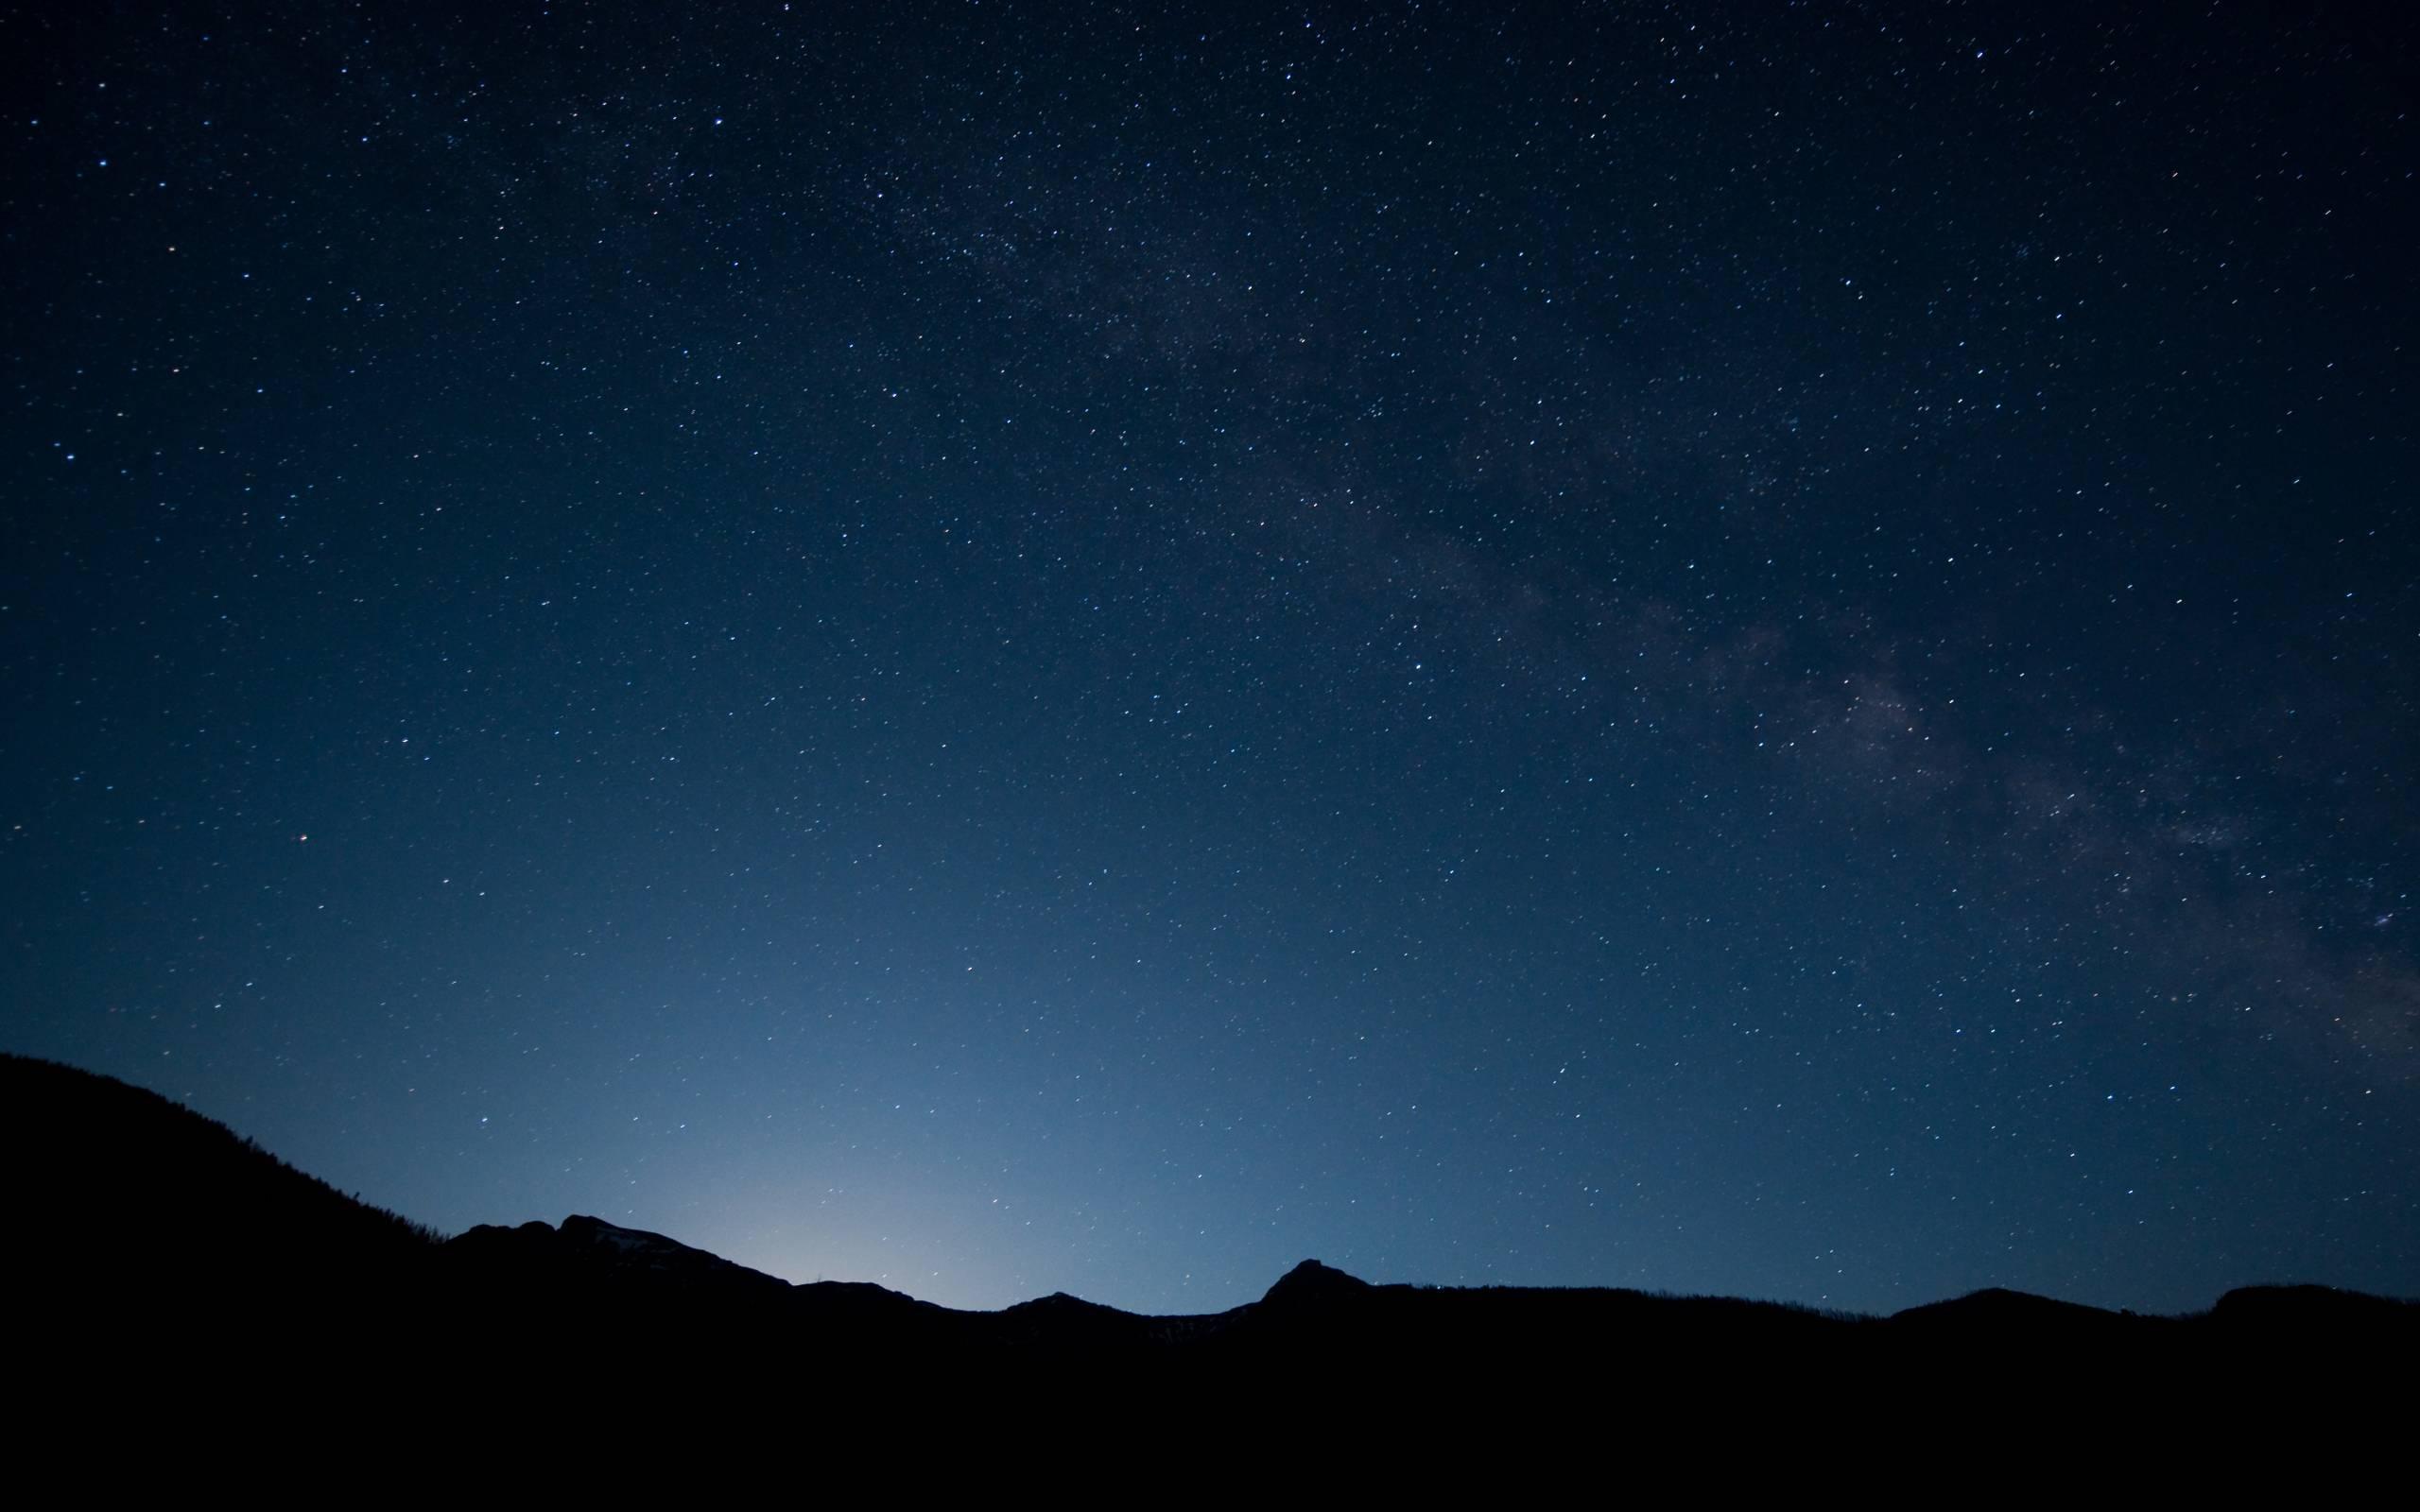 city night sky background - photo #1